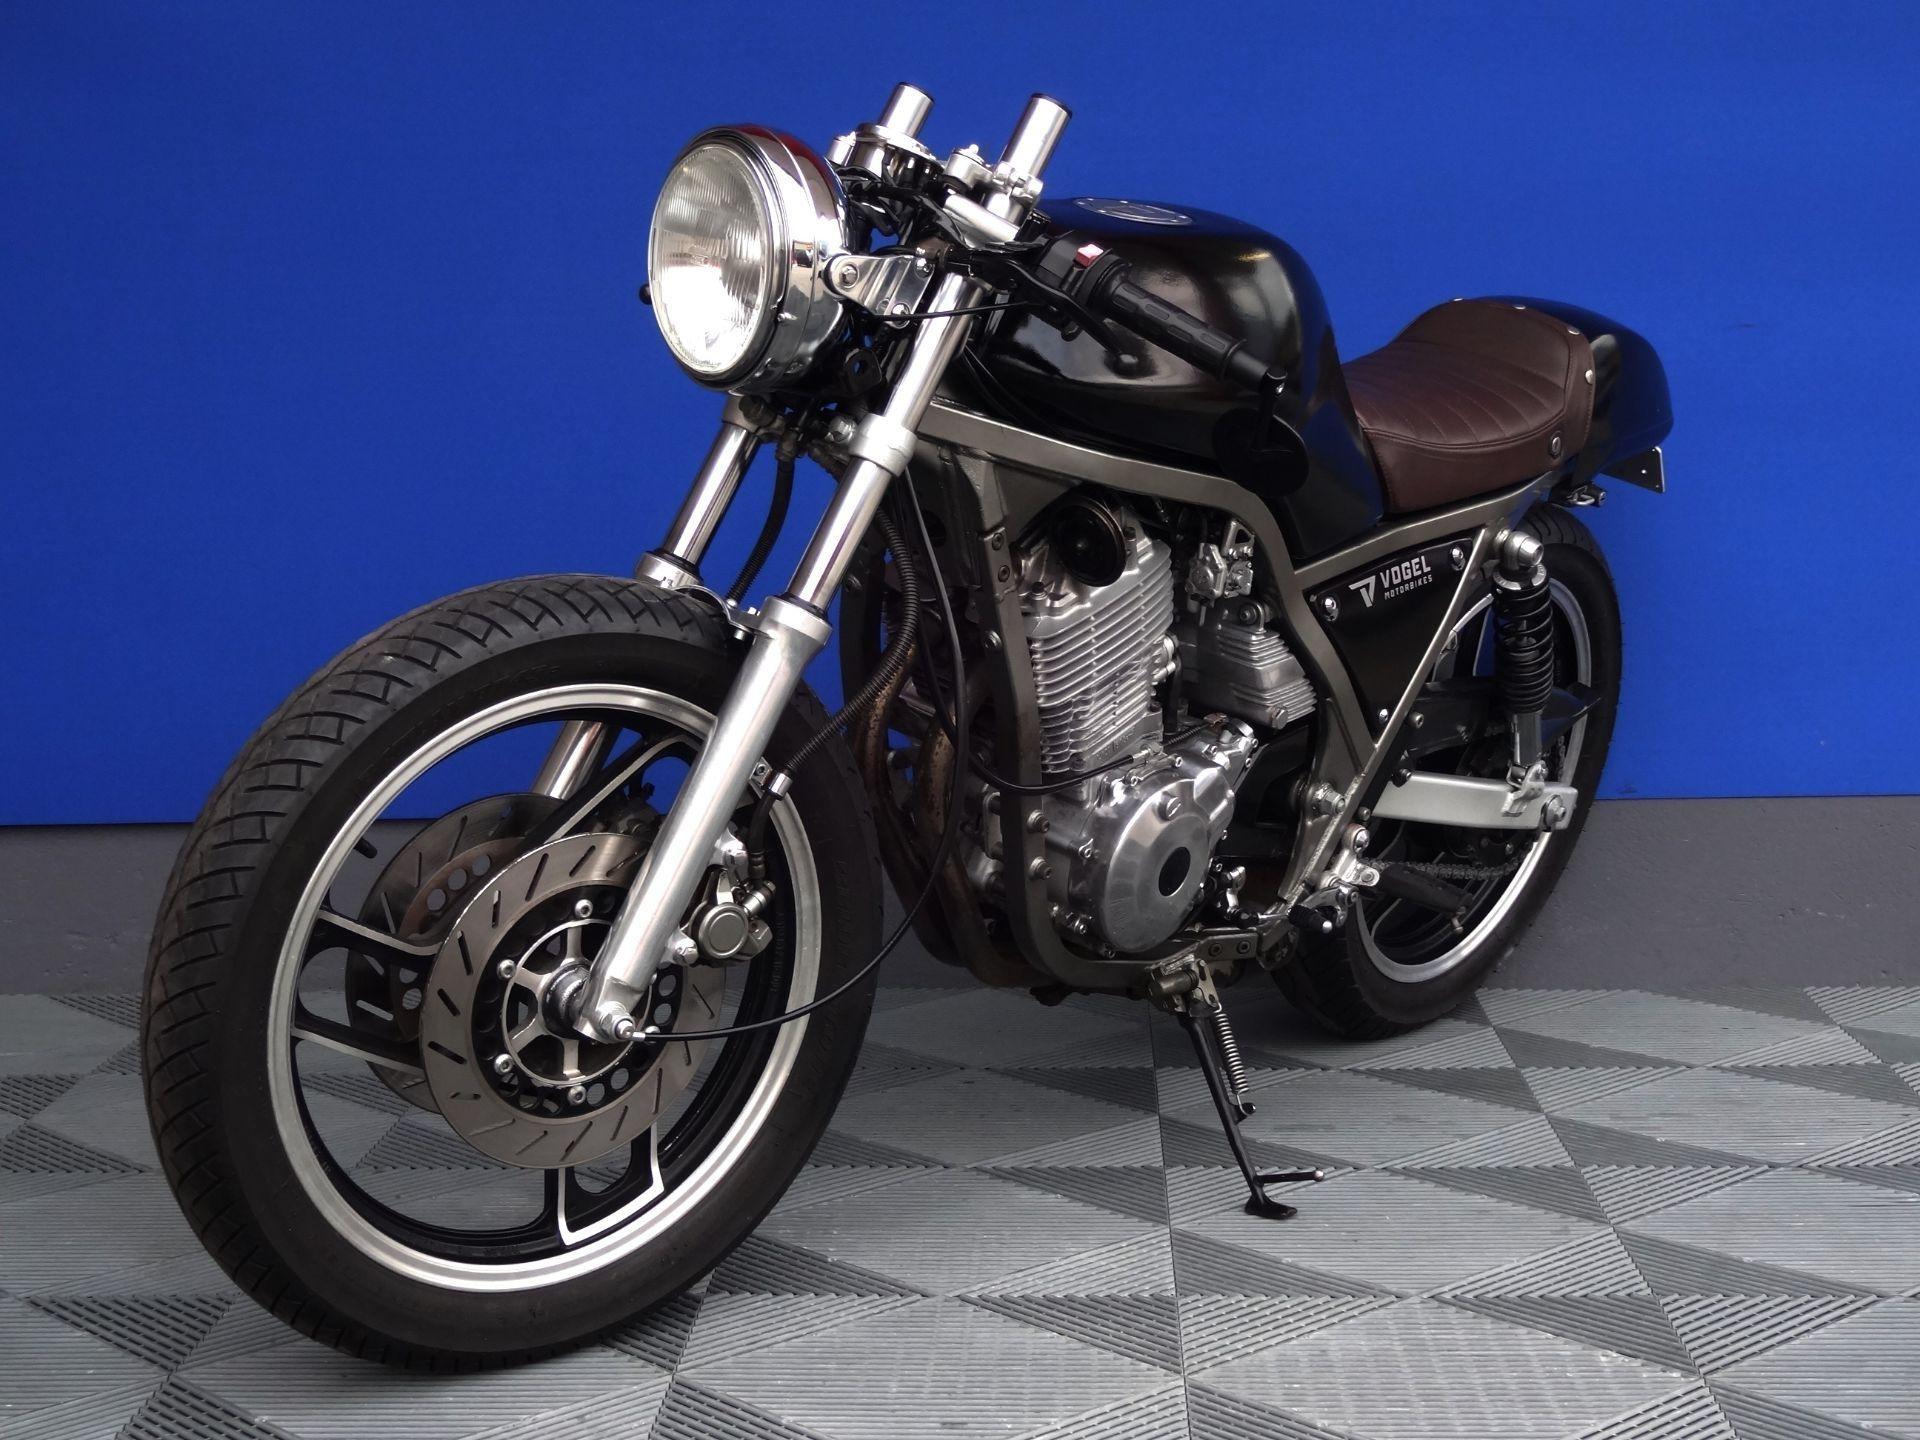 moto occasions acheter yamaha srx 600 cafe racer vogel motorbikes sch pfheim. Black Bedroom Furniture Sets. Home Design Ideas